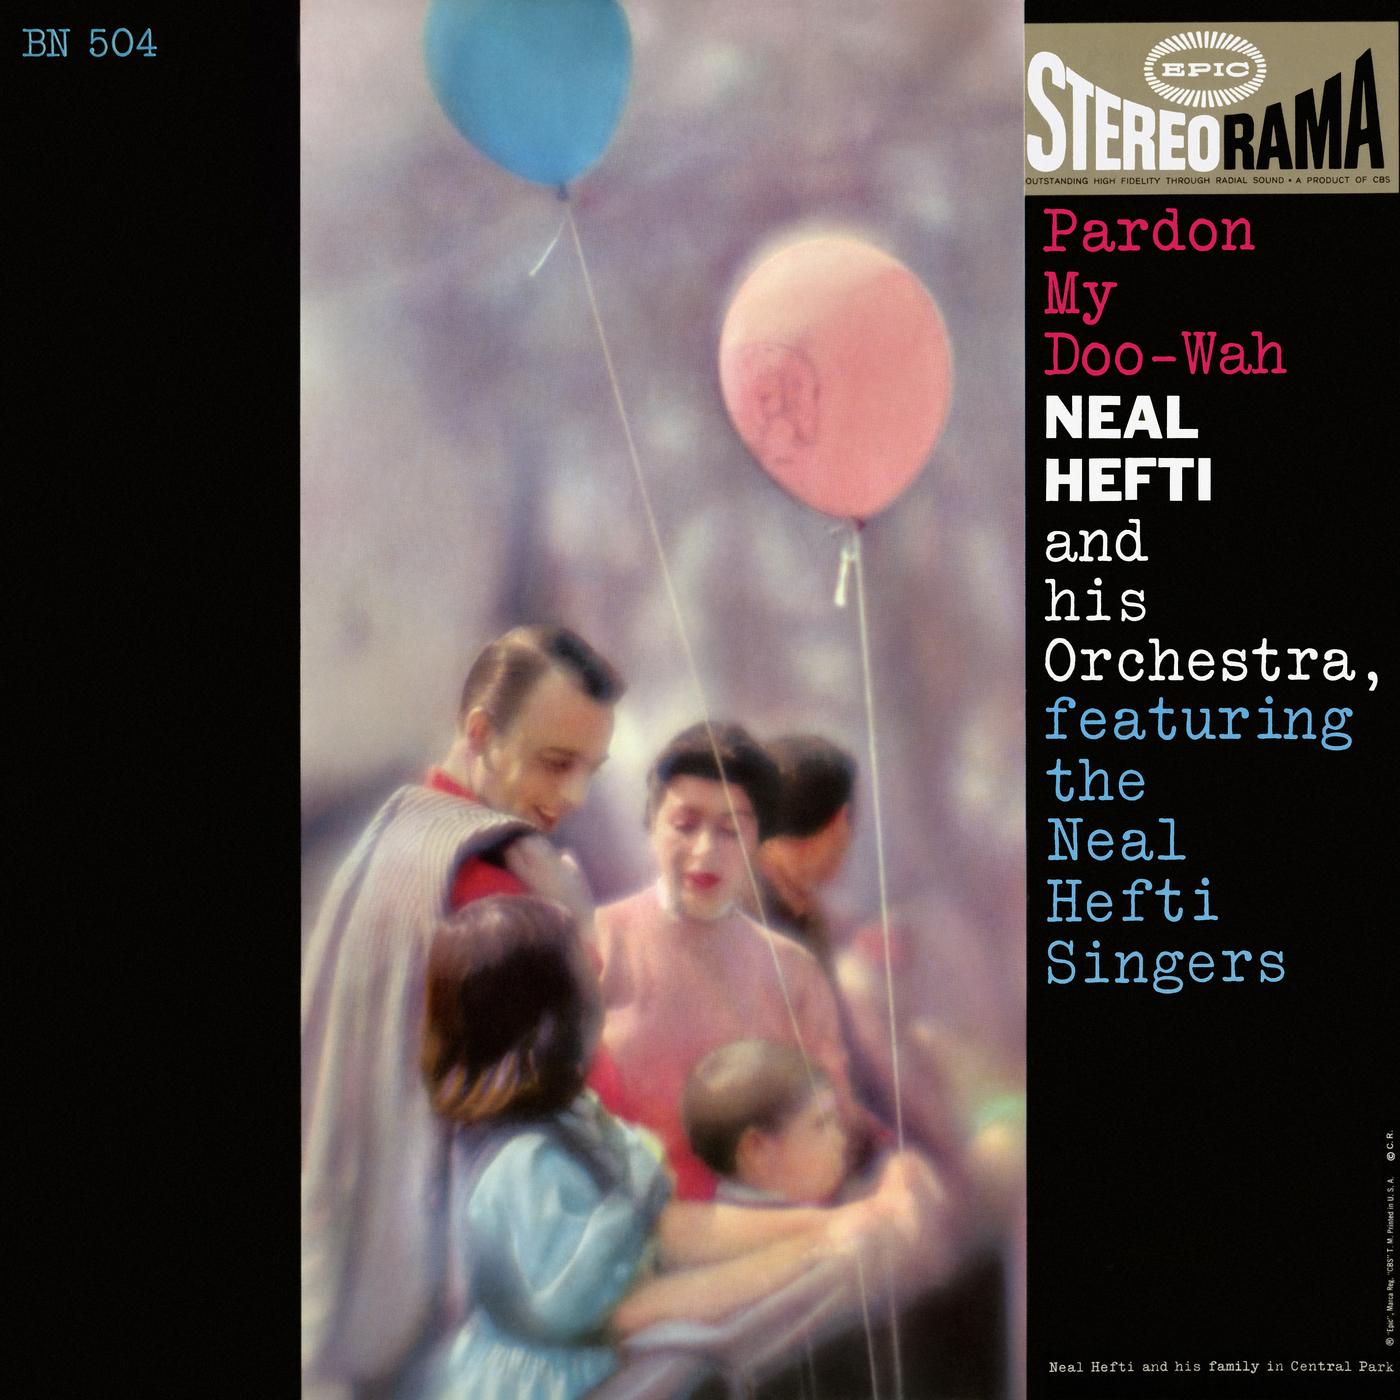 Pardon My Doo-Wah - Neal Hefti and His Orchestra